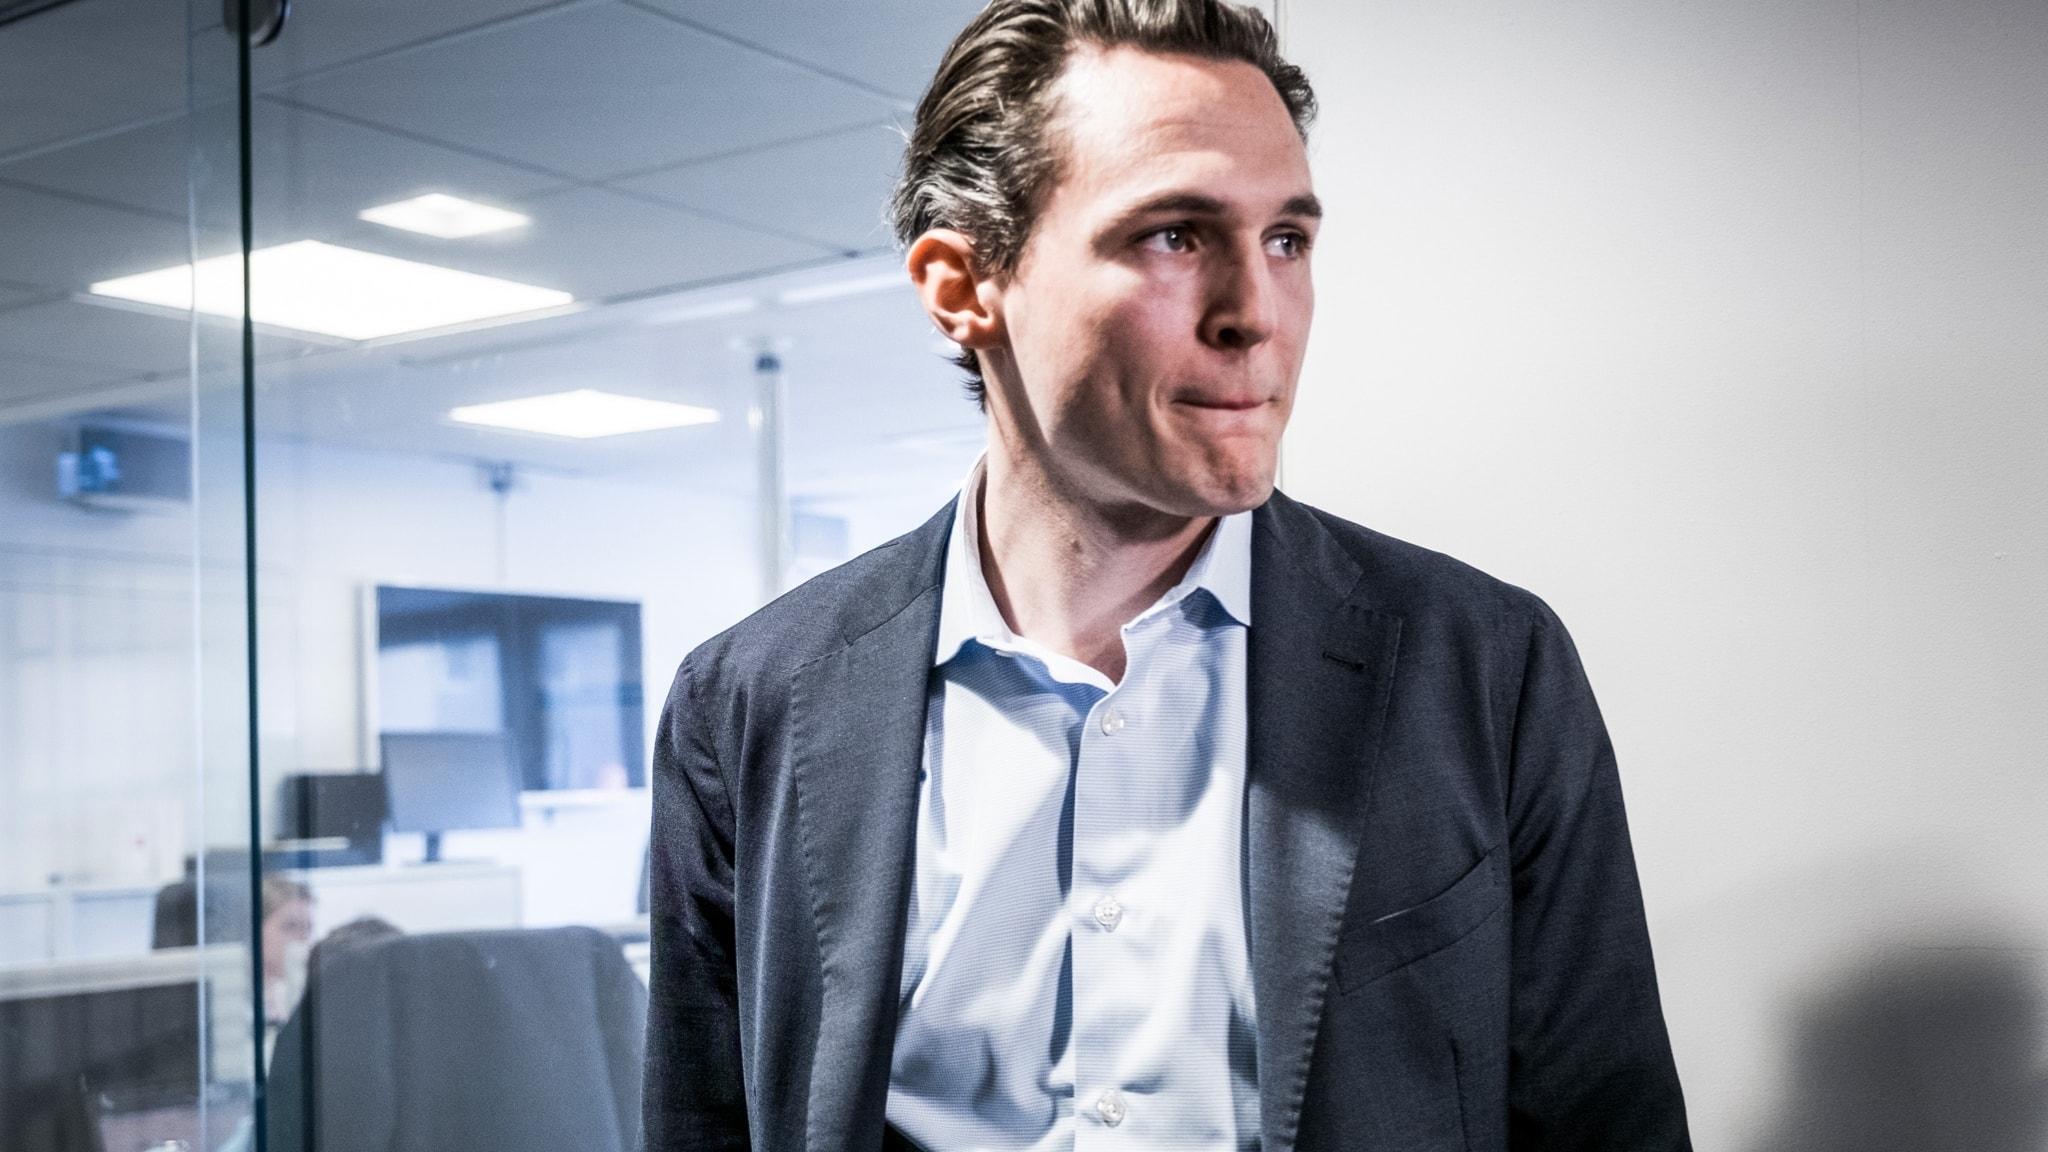 Allras vd Alexander Ernstberger häktas